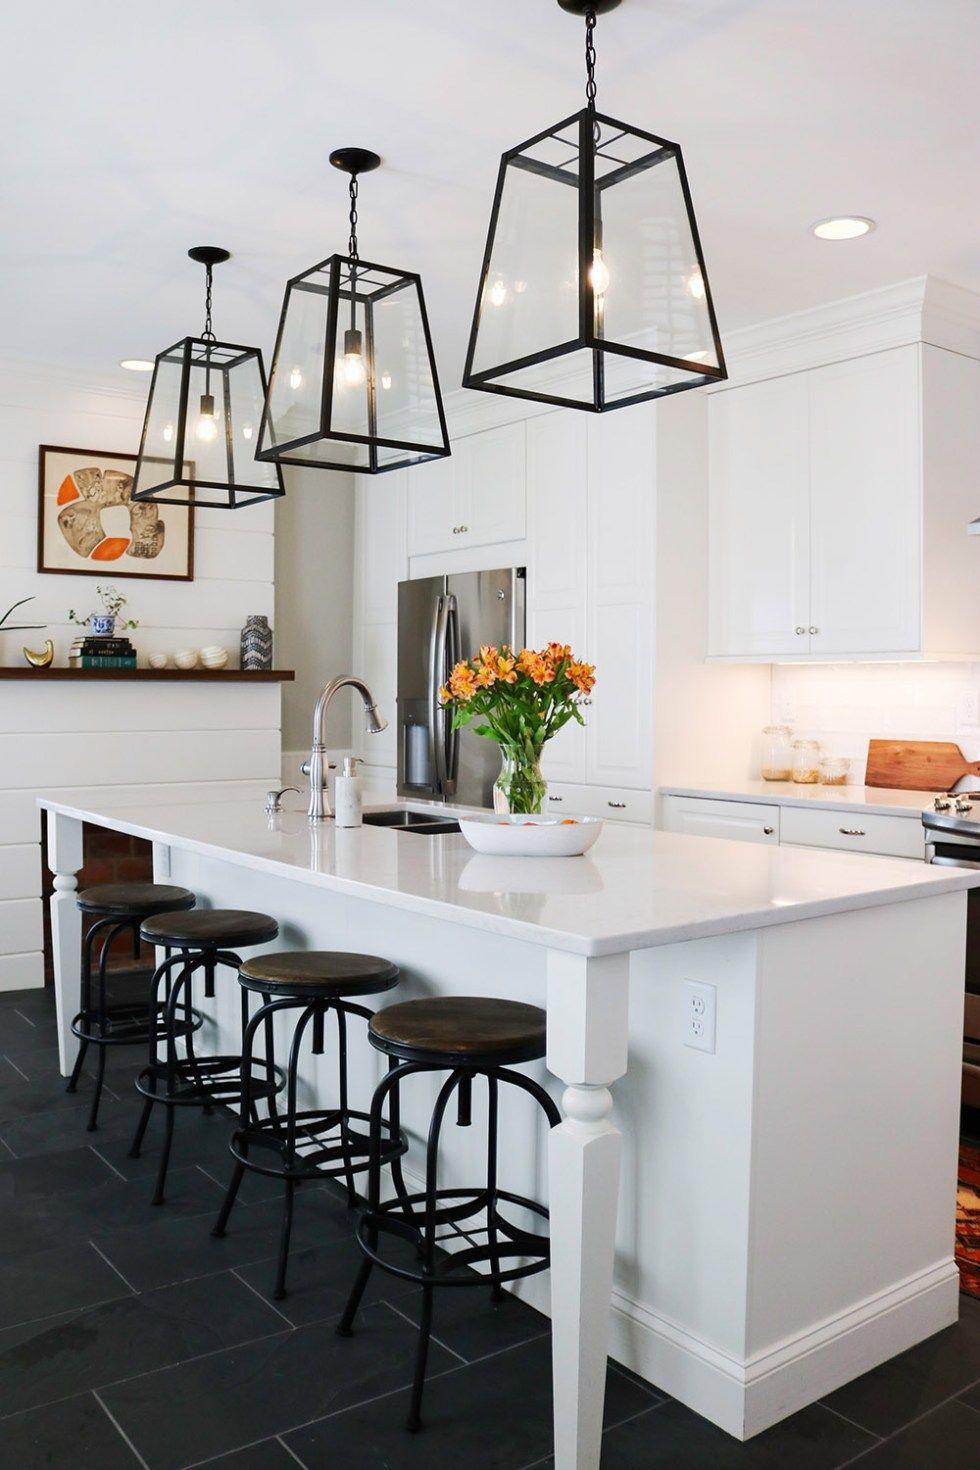 historic fells point row house ikea kitchen remodel | kitchen design